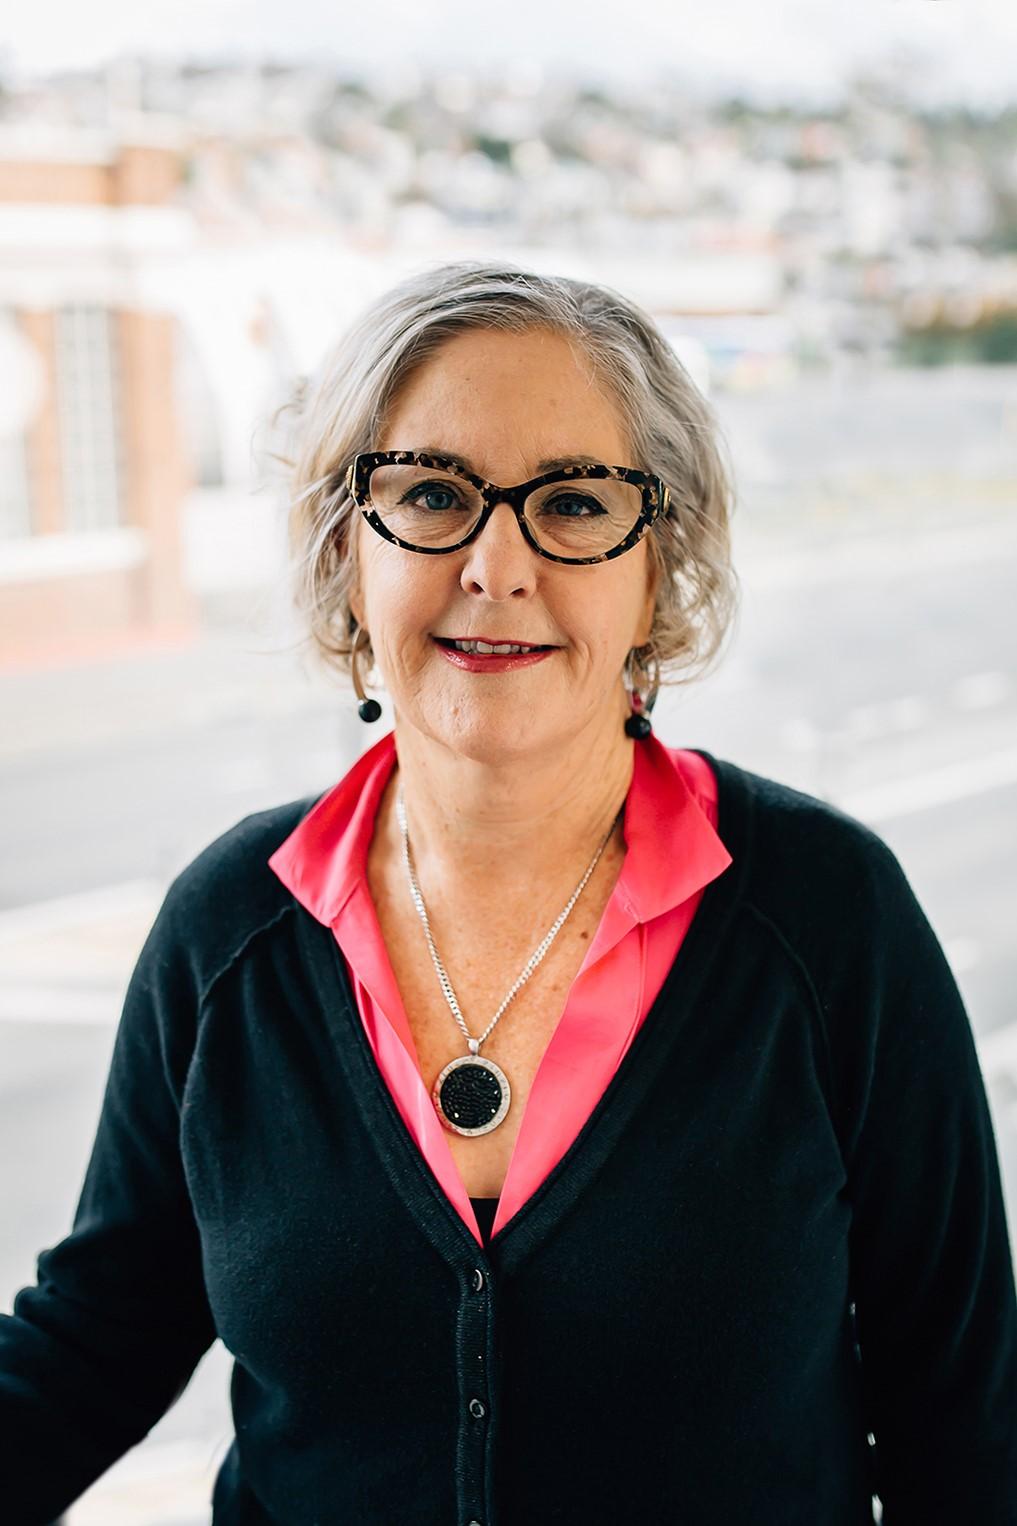 Lesley Osenieks - Psychologist